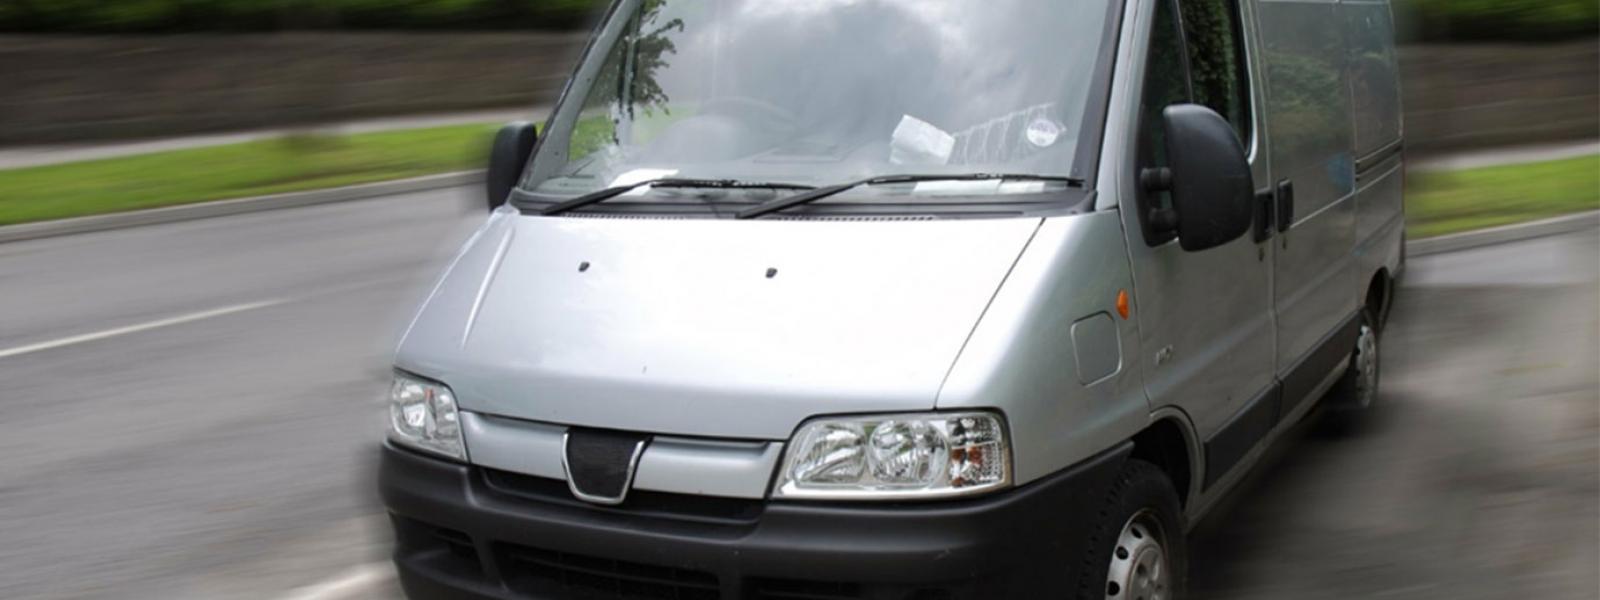 A silver van – laws van drivers need to know